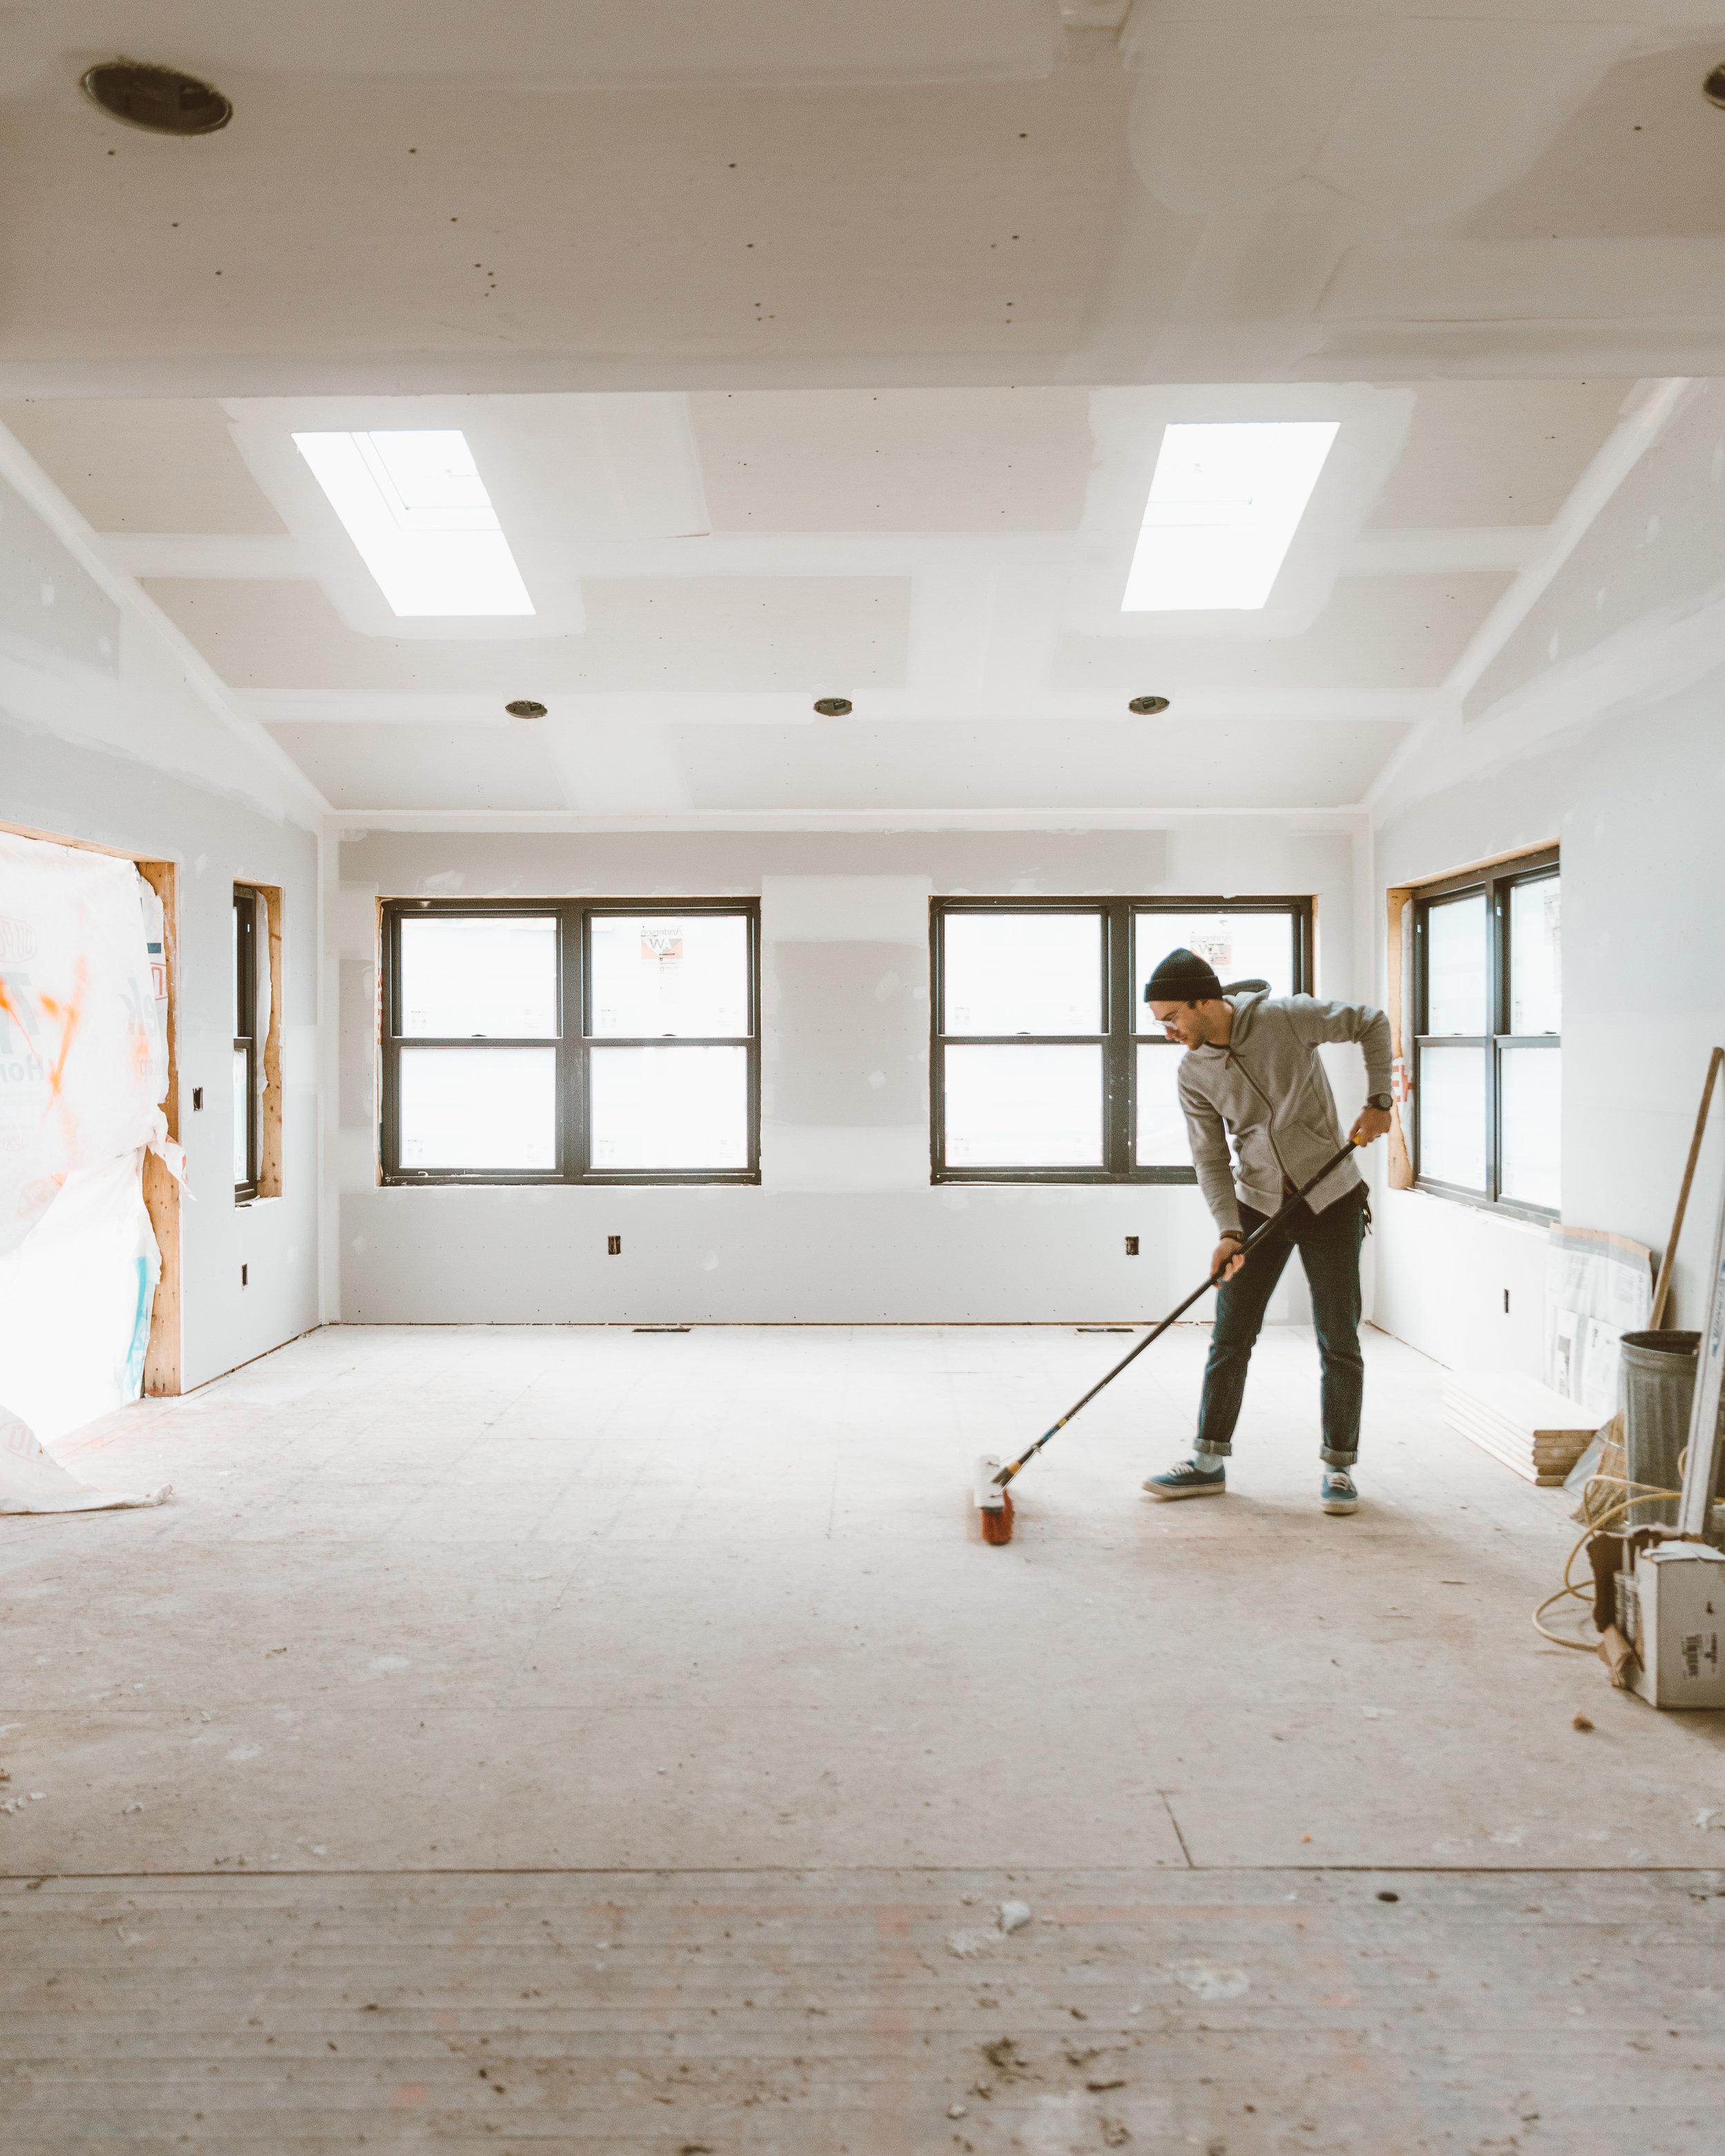 forthehome-renovation-drywall0007.jpg